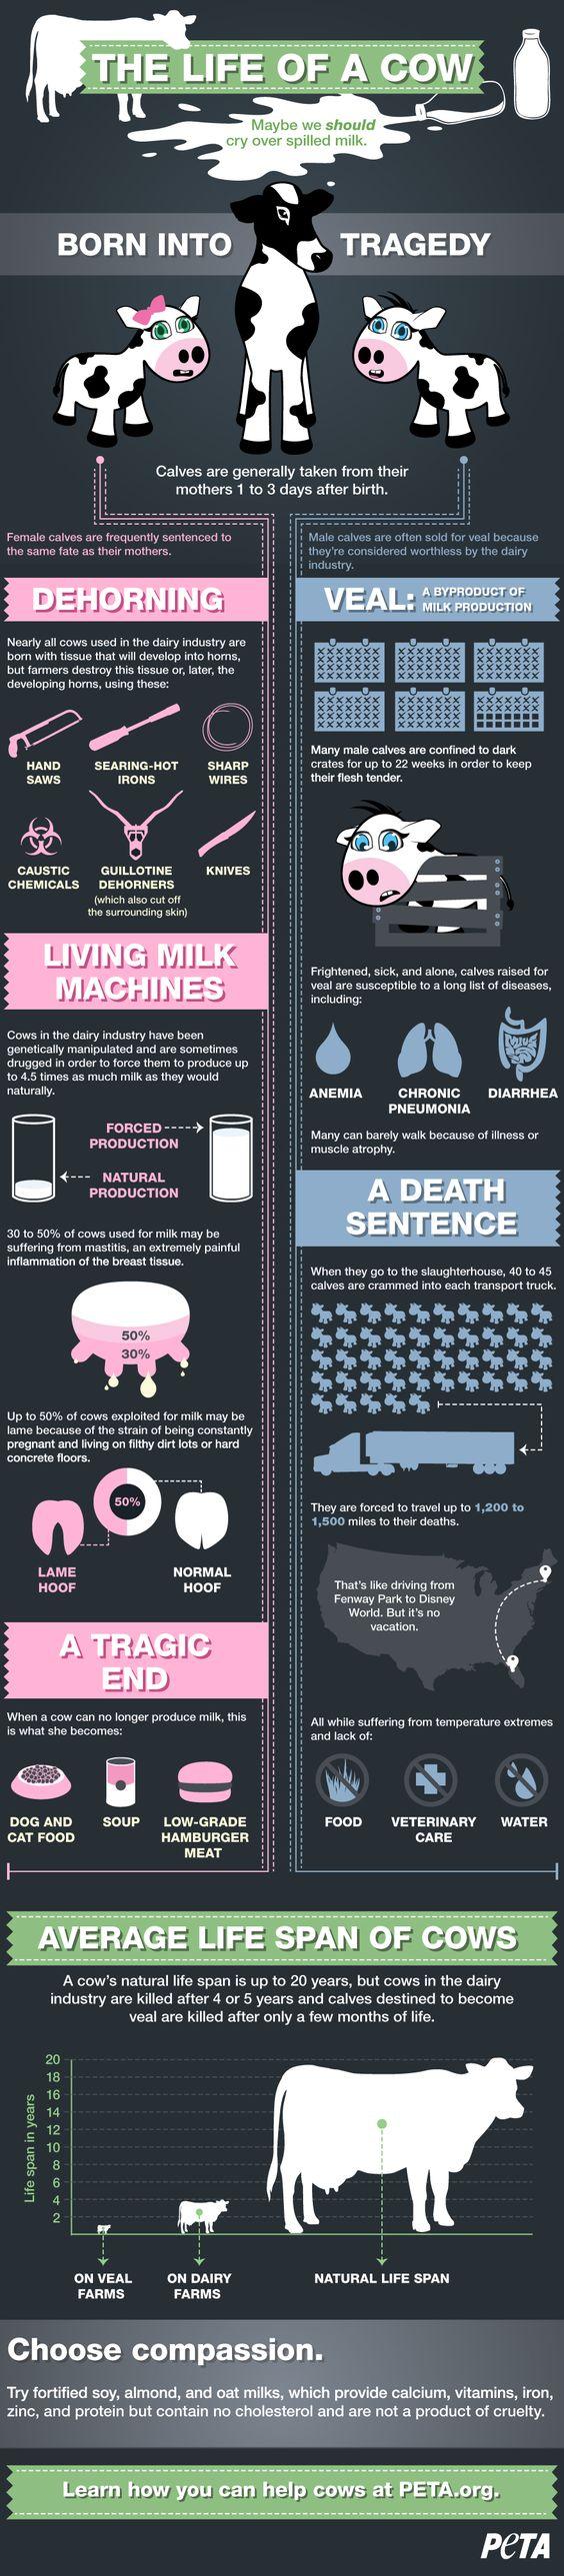 vegan: The Life of A Cow (Infographic) | PETA.org: